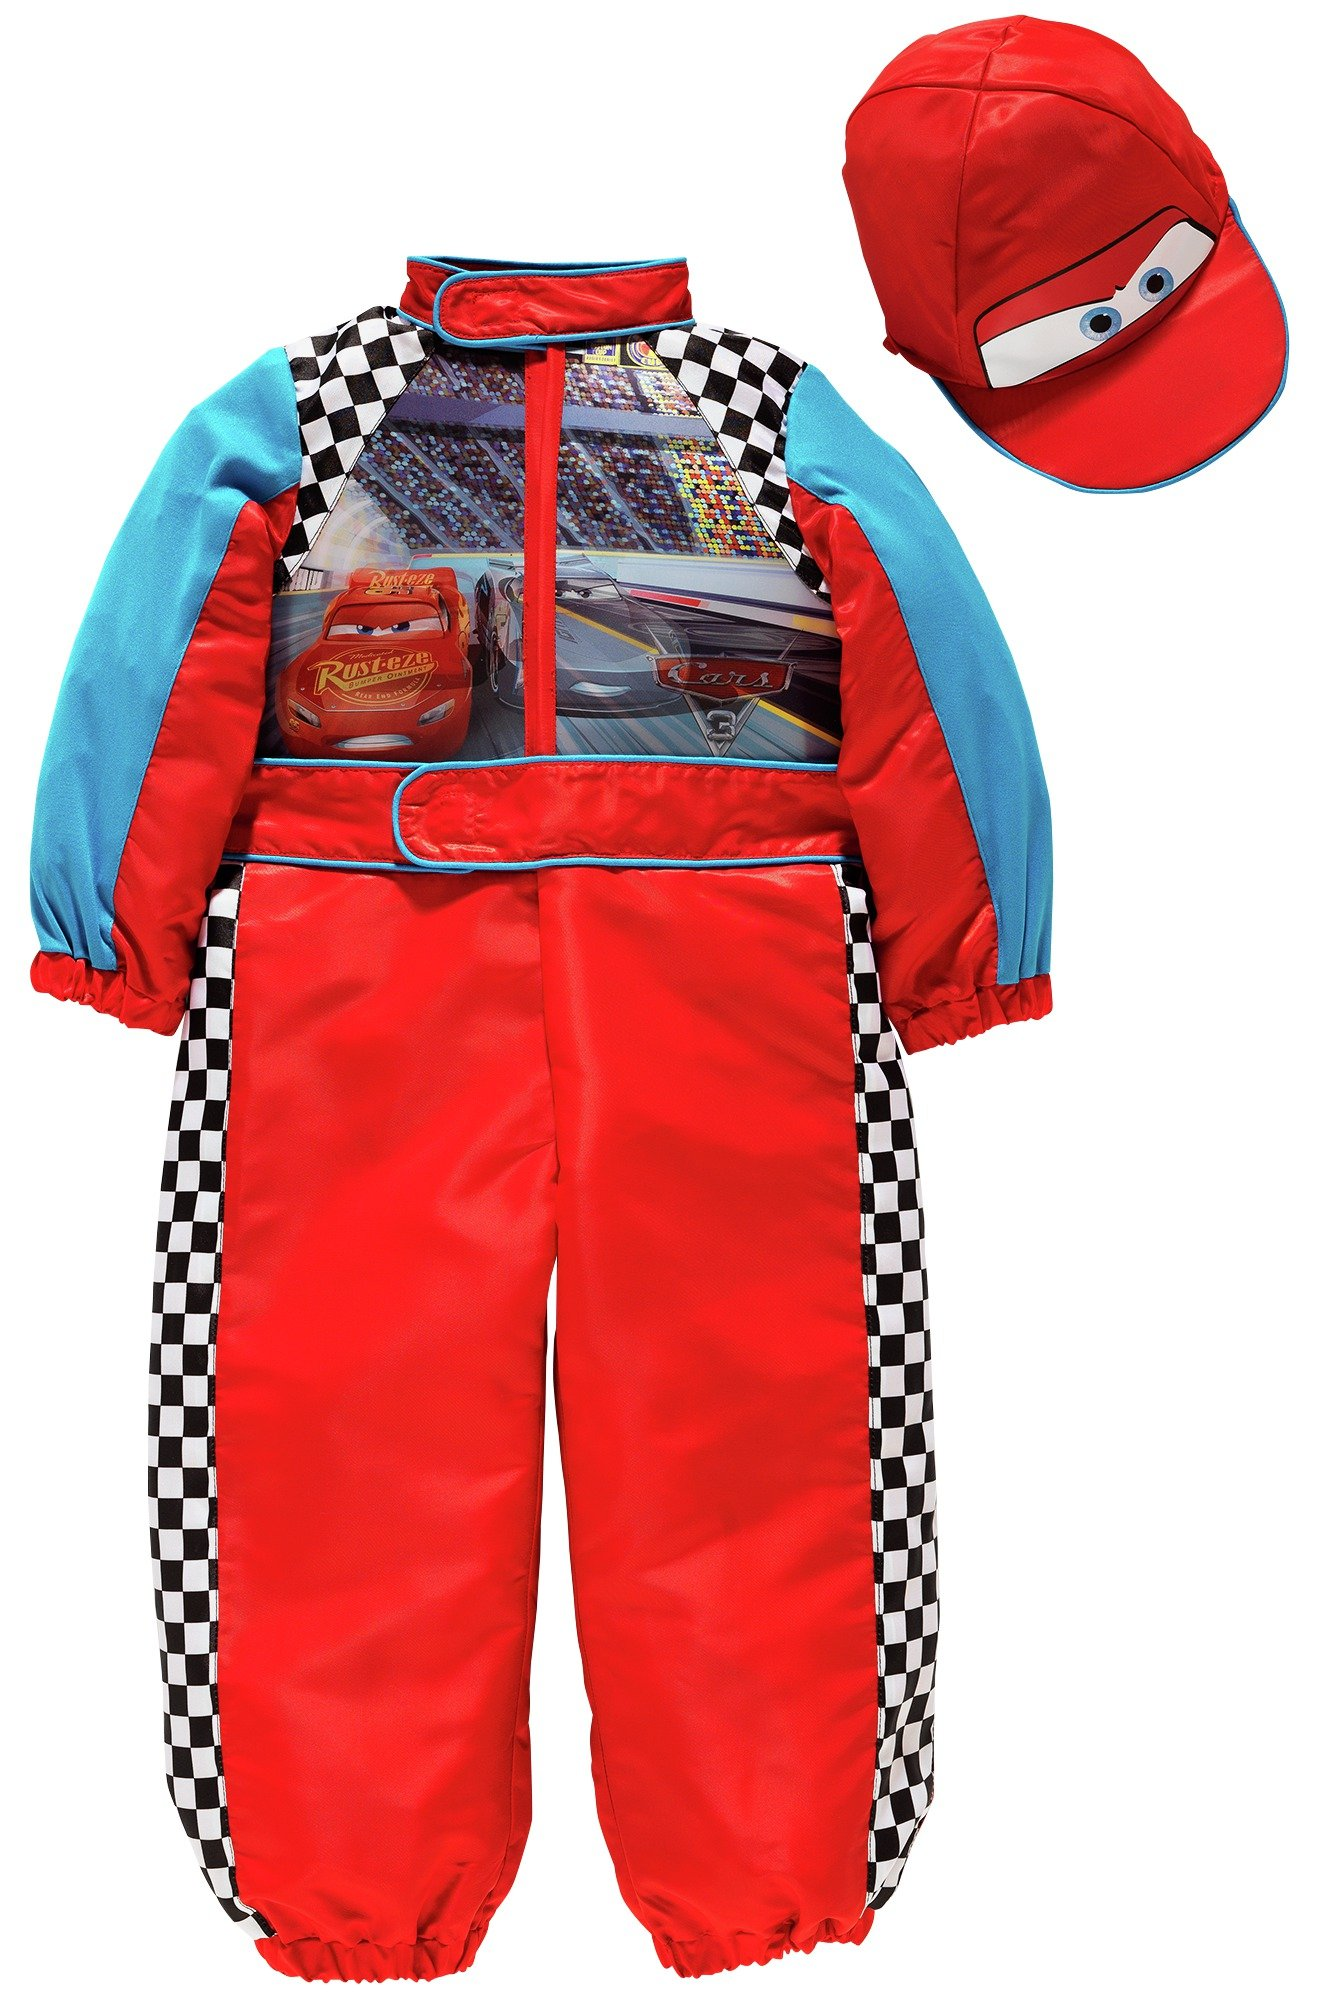 Disney Cars Racing Car Fancy Dress Costume - 5-6 Years